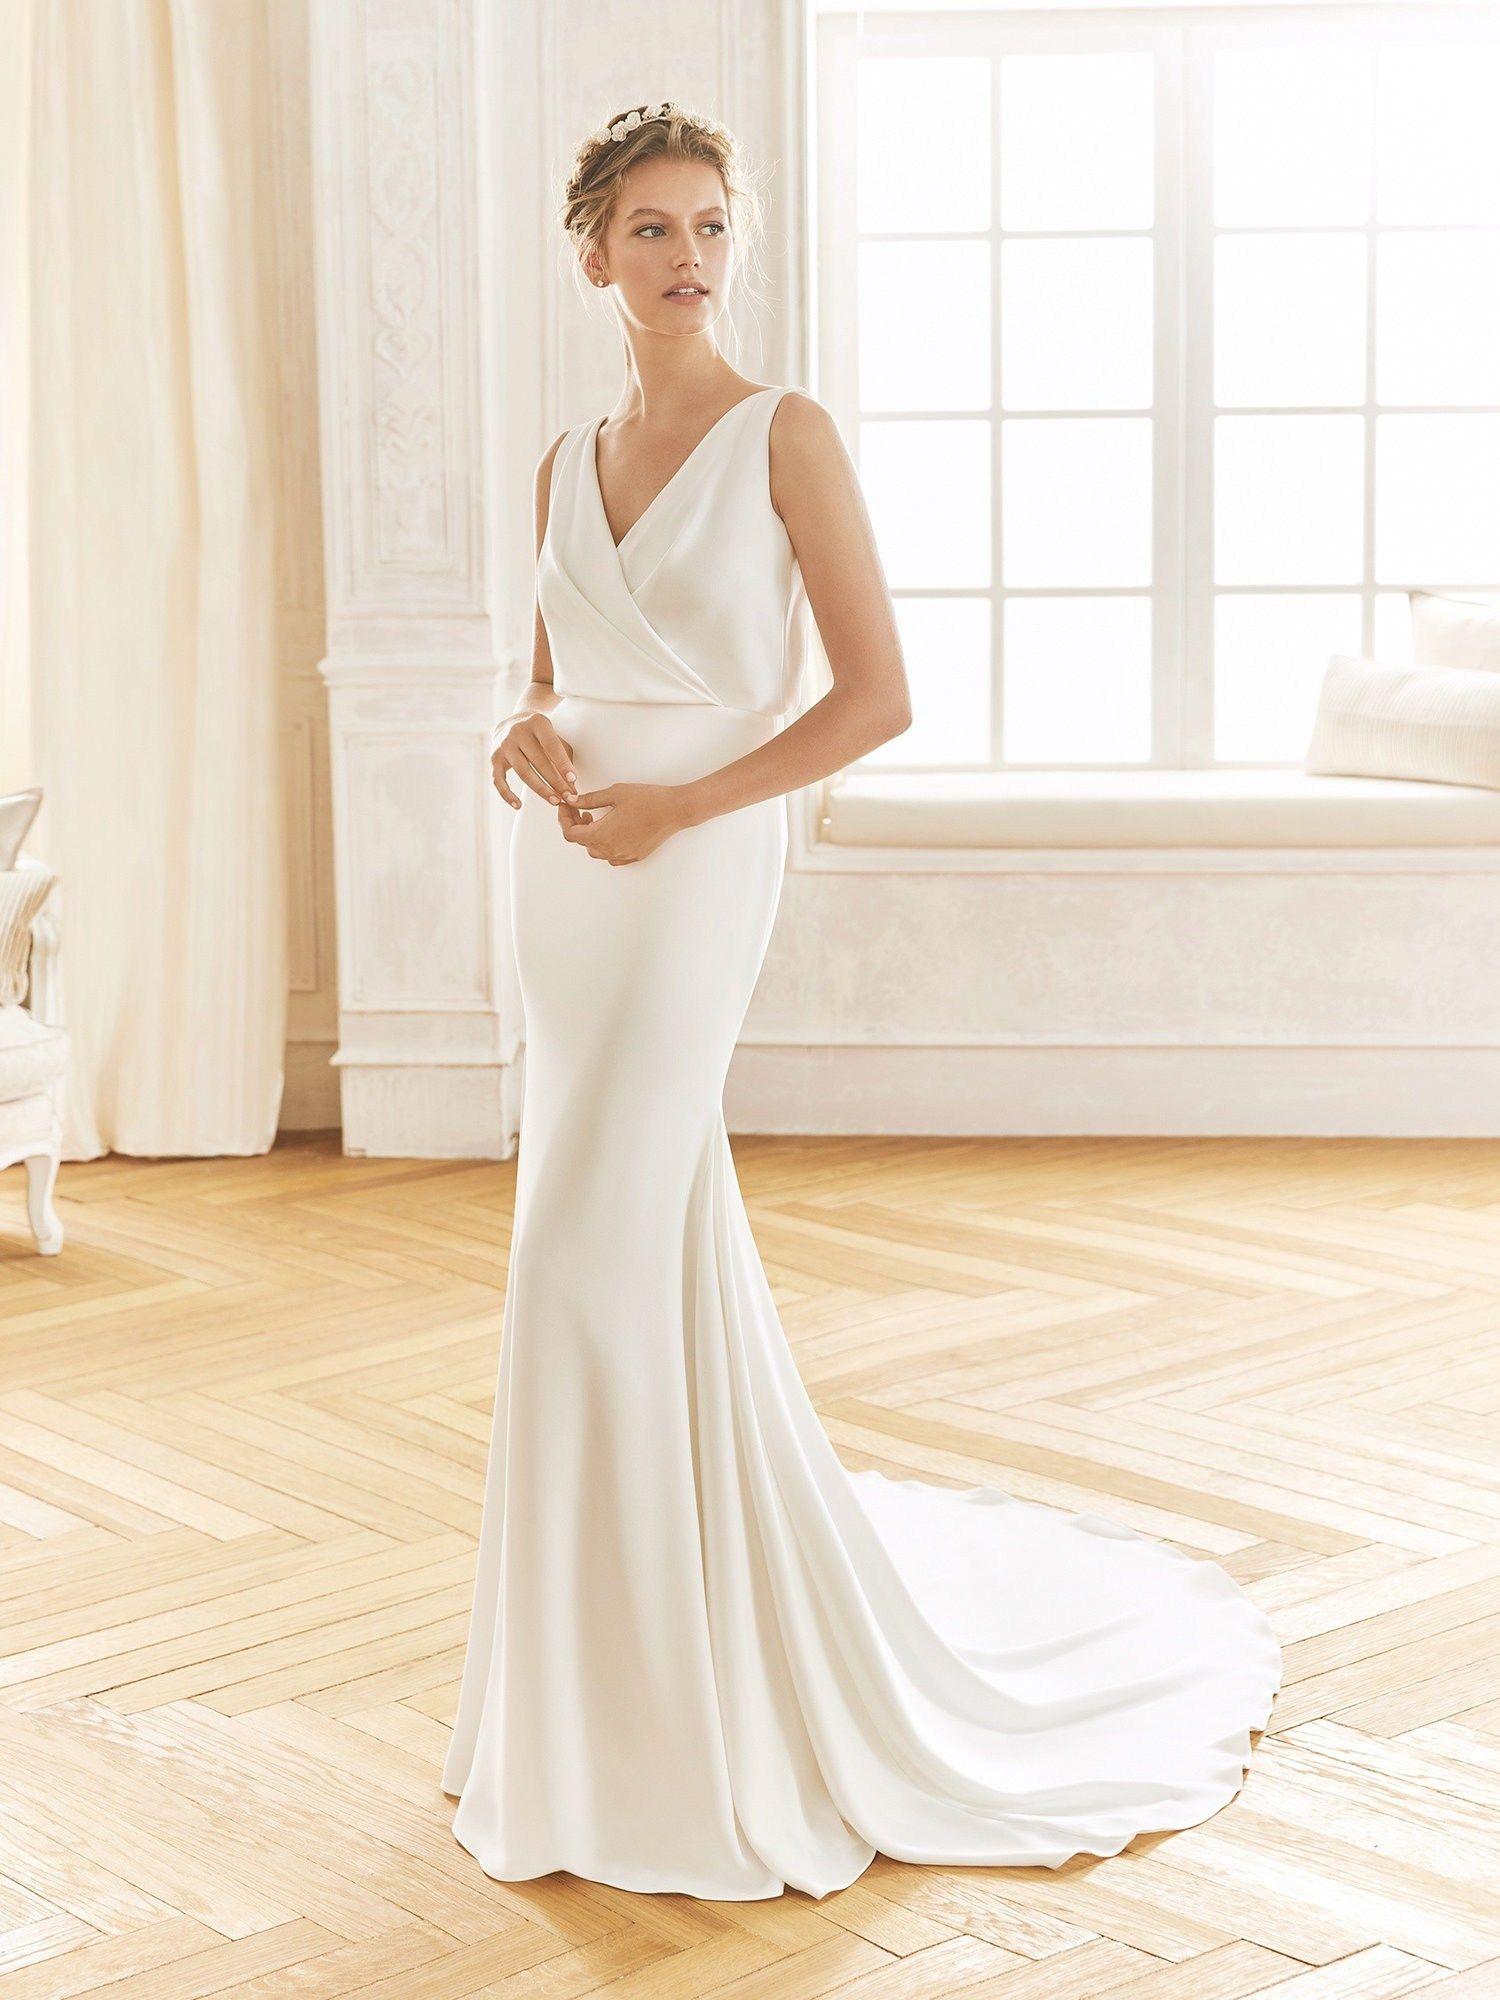 49 Elegant Cheap Chiffon Wedding Dresses Pics Wedding Dress Gallery Rental Wedding Dresses Alternative Wedding Dresses Sweet Wedding Dresses